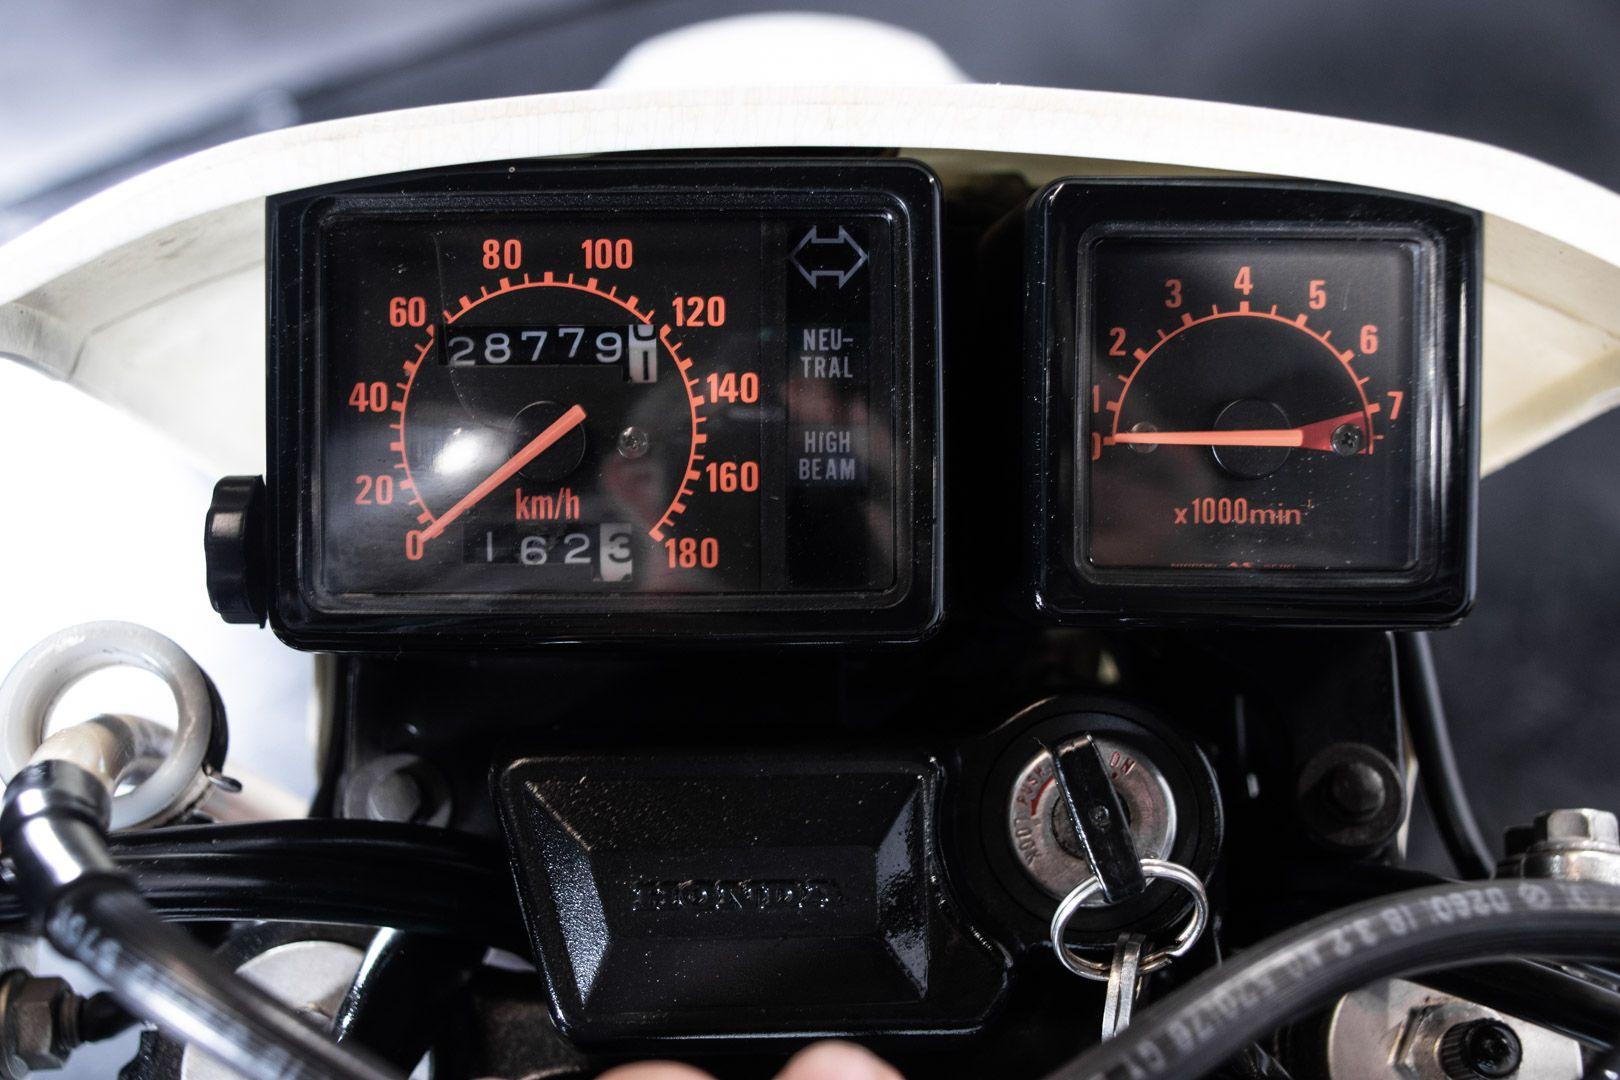 1987 HONDA XL 600 RM 82787